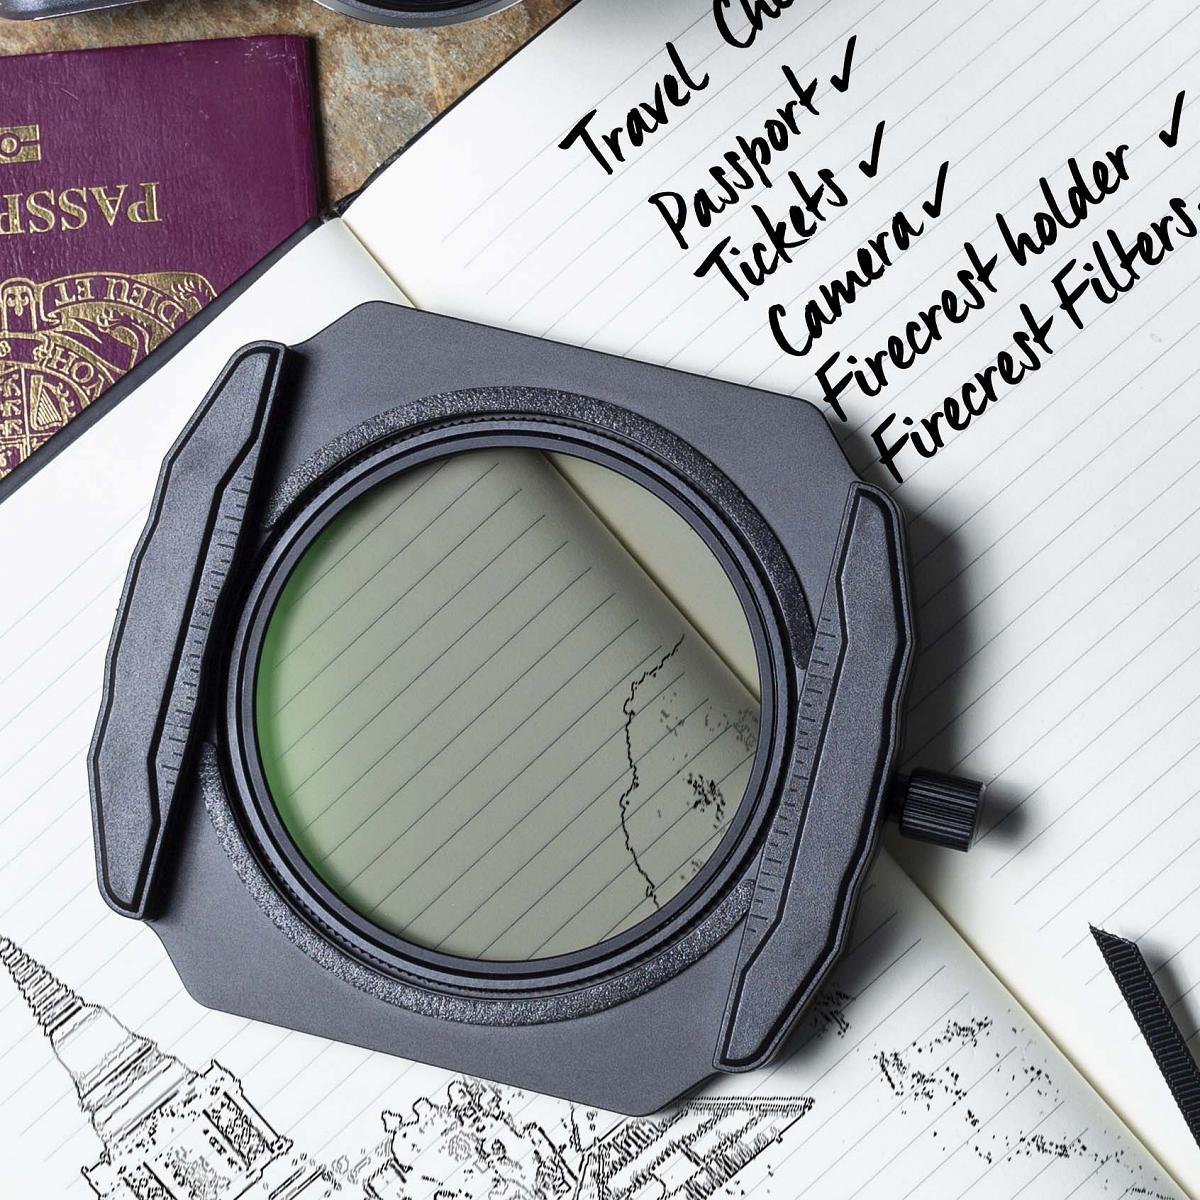 Formatt Hitech Firecrest 85mm filter holder